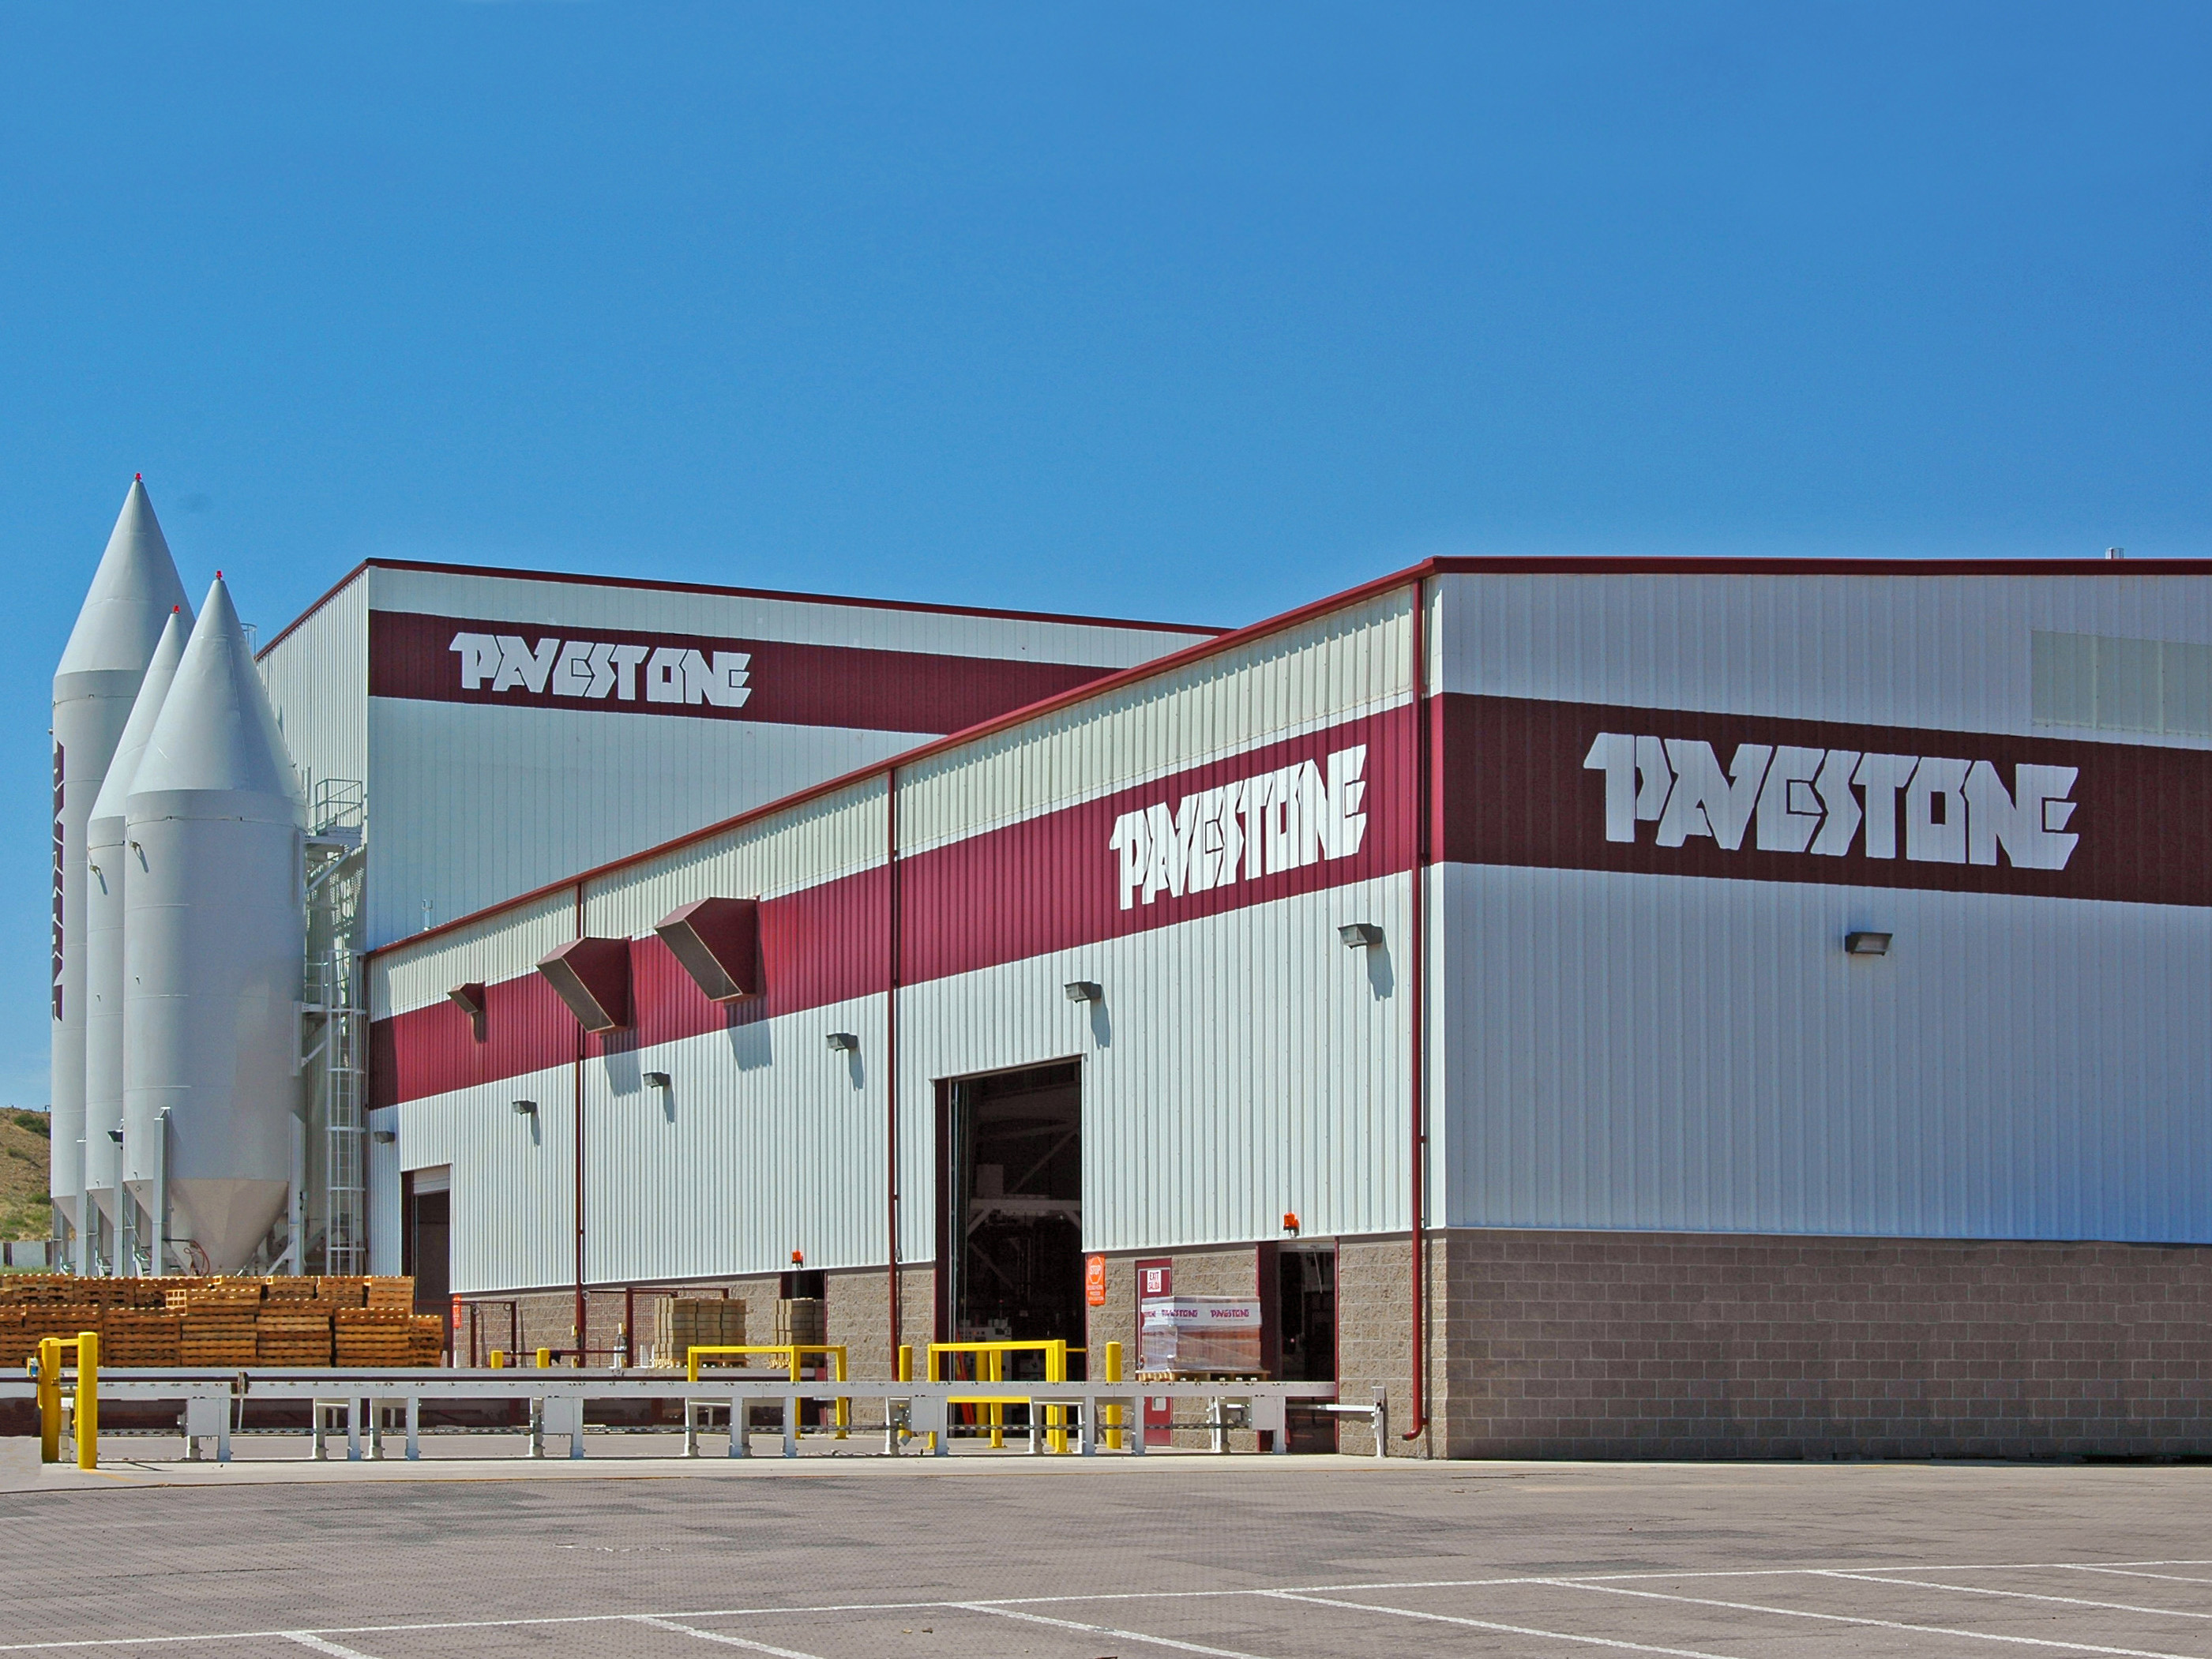 Pavestone Manufacturing